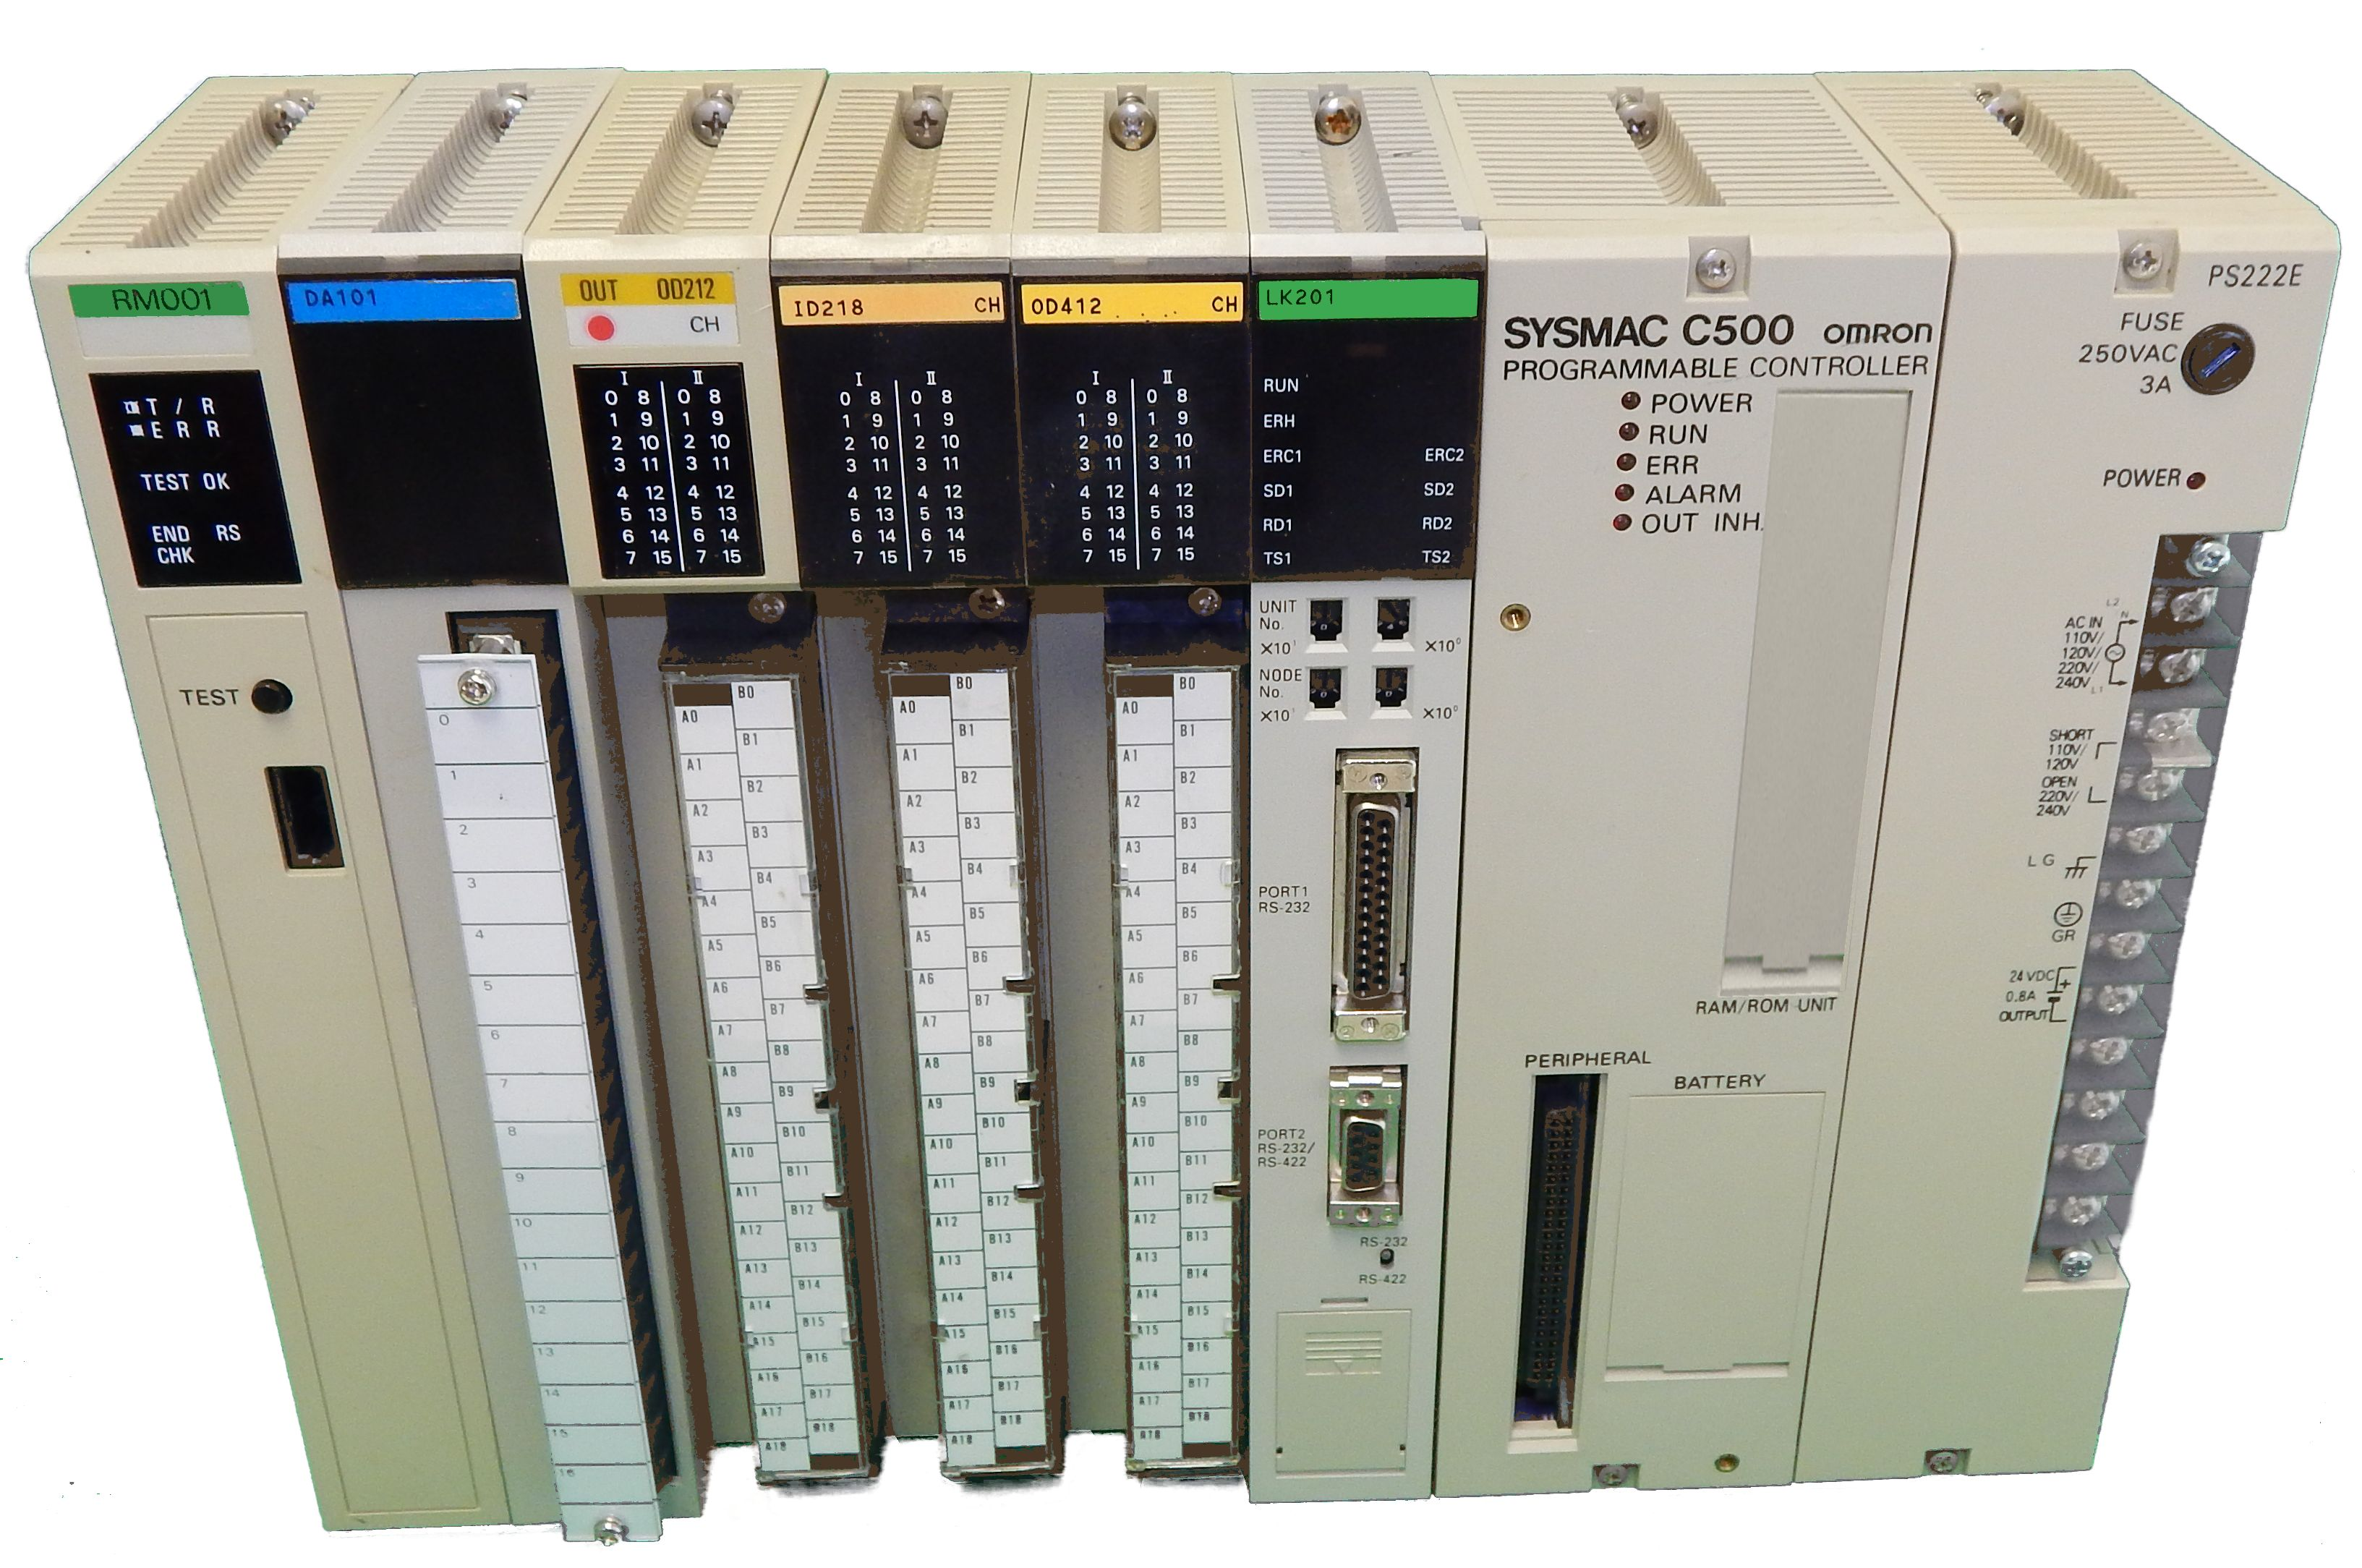 3G2C7-CPU24-E